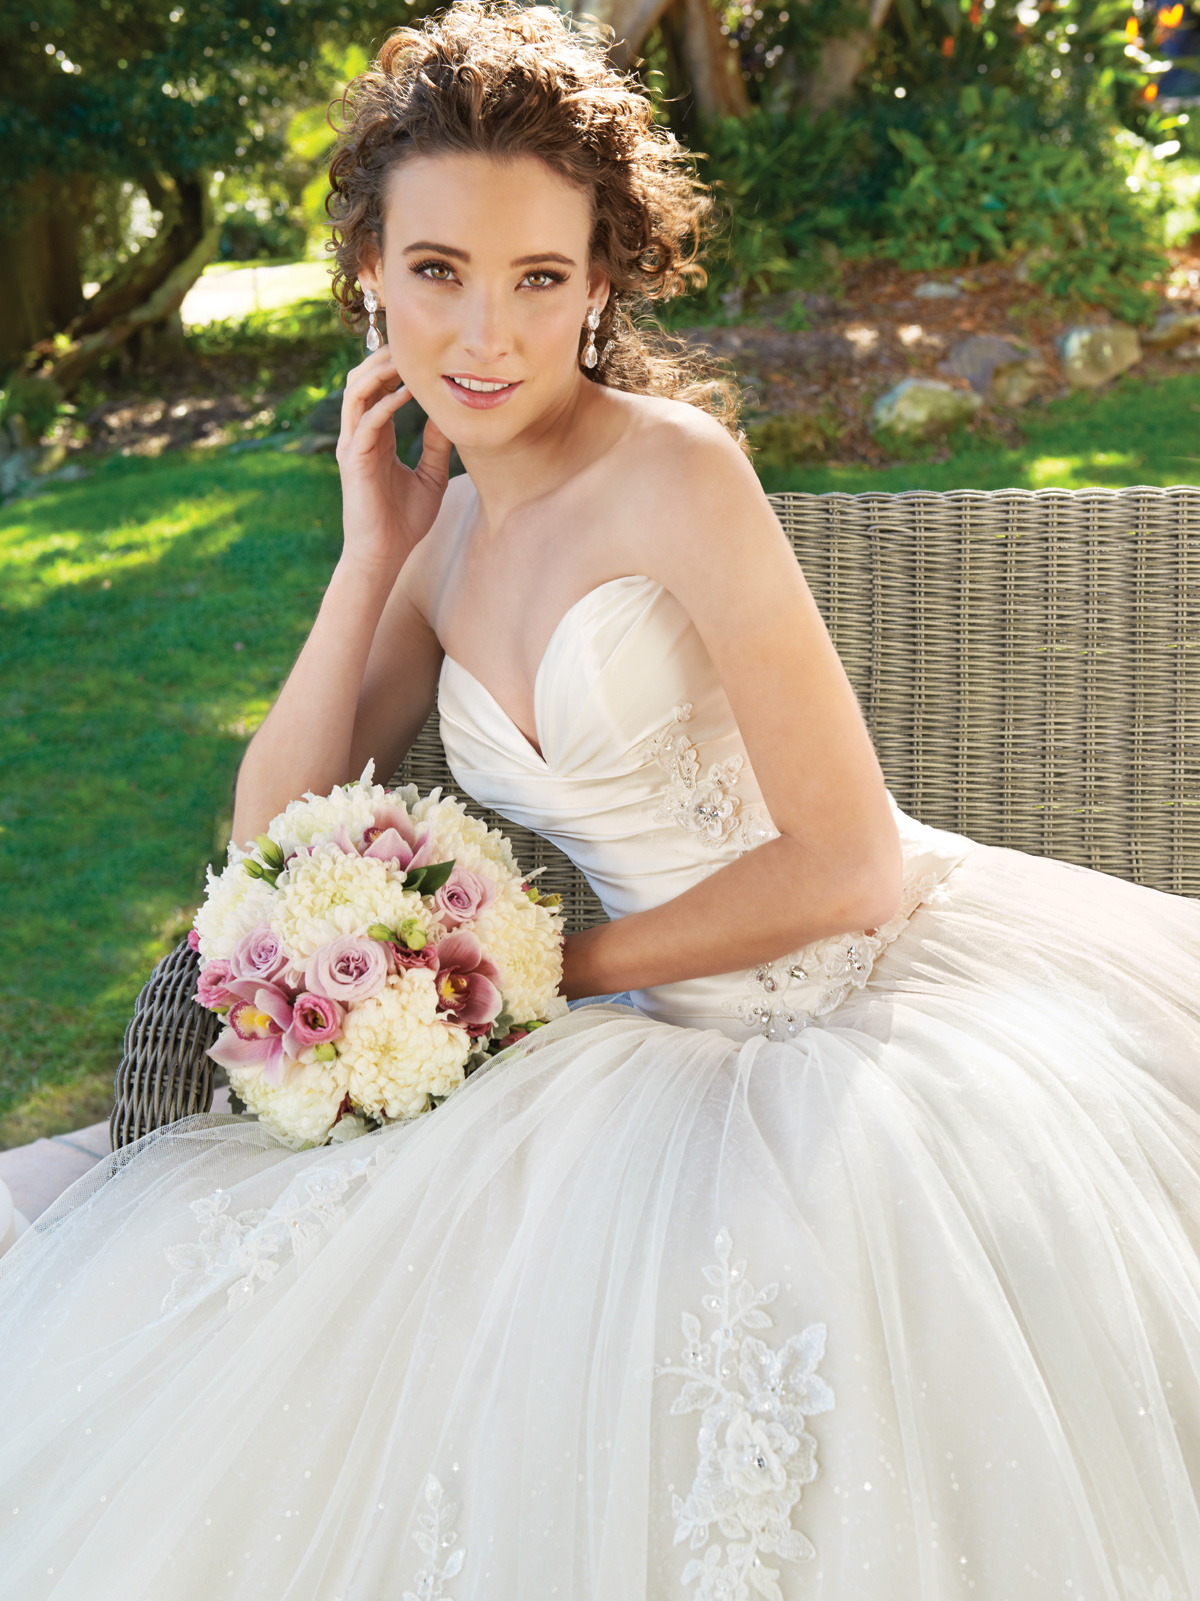 Sweetheart Ball Gown Wedding Dresses